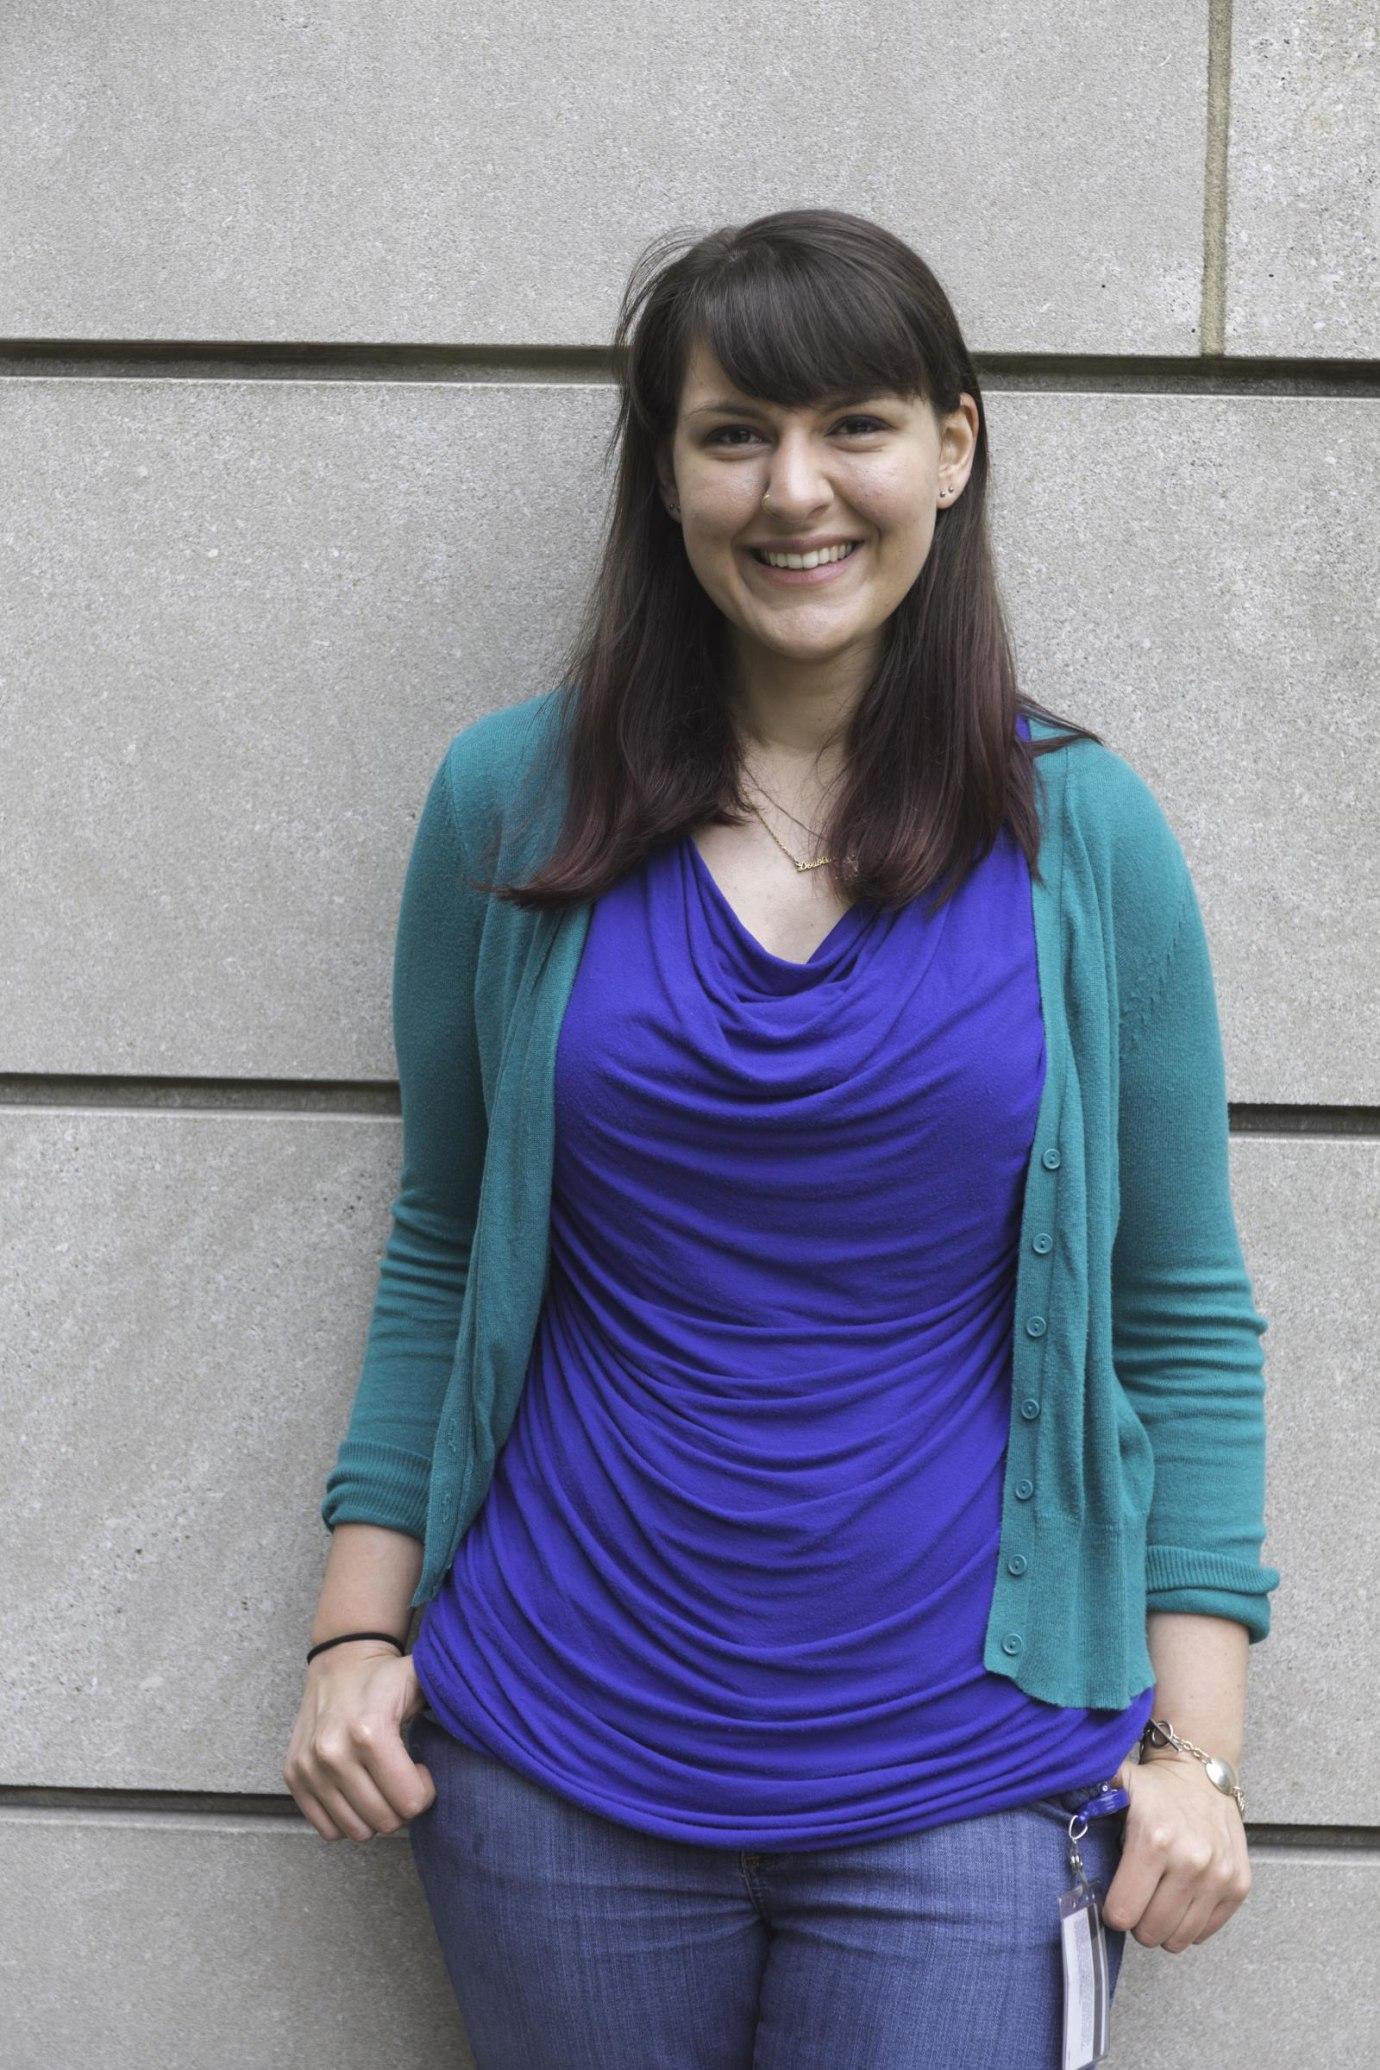 Caitlin Moss, Microbiology Track, Photo Credit: Folasade Kammen